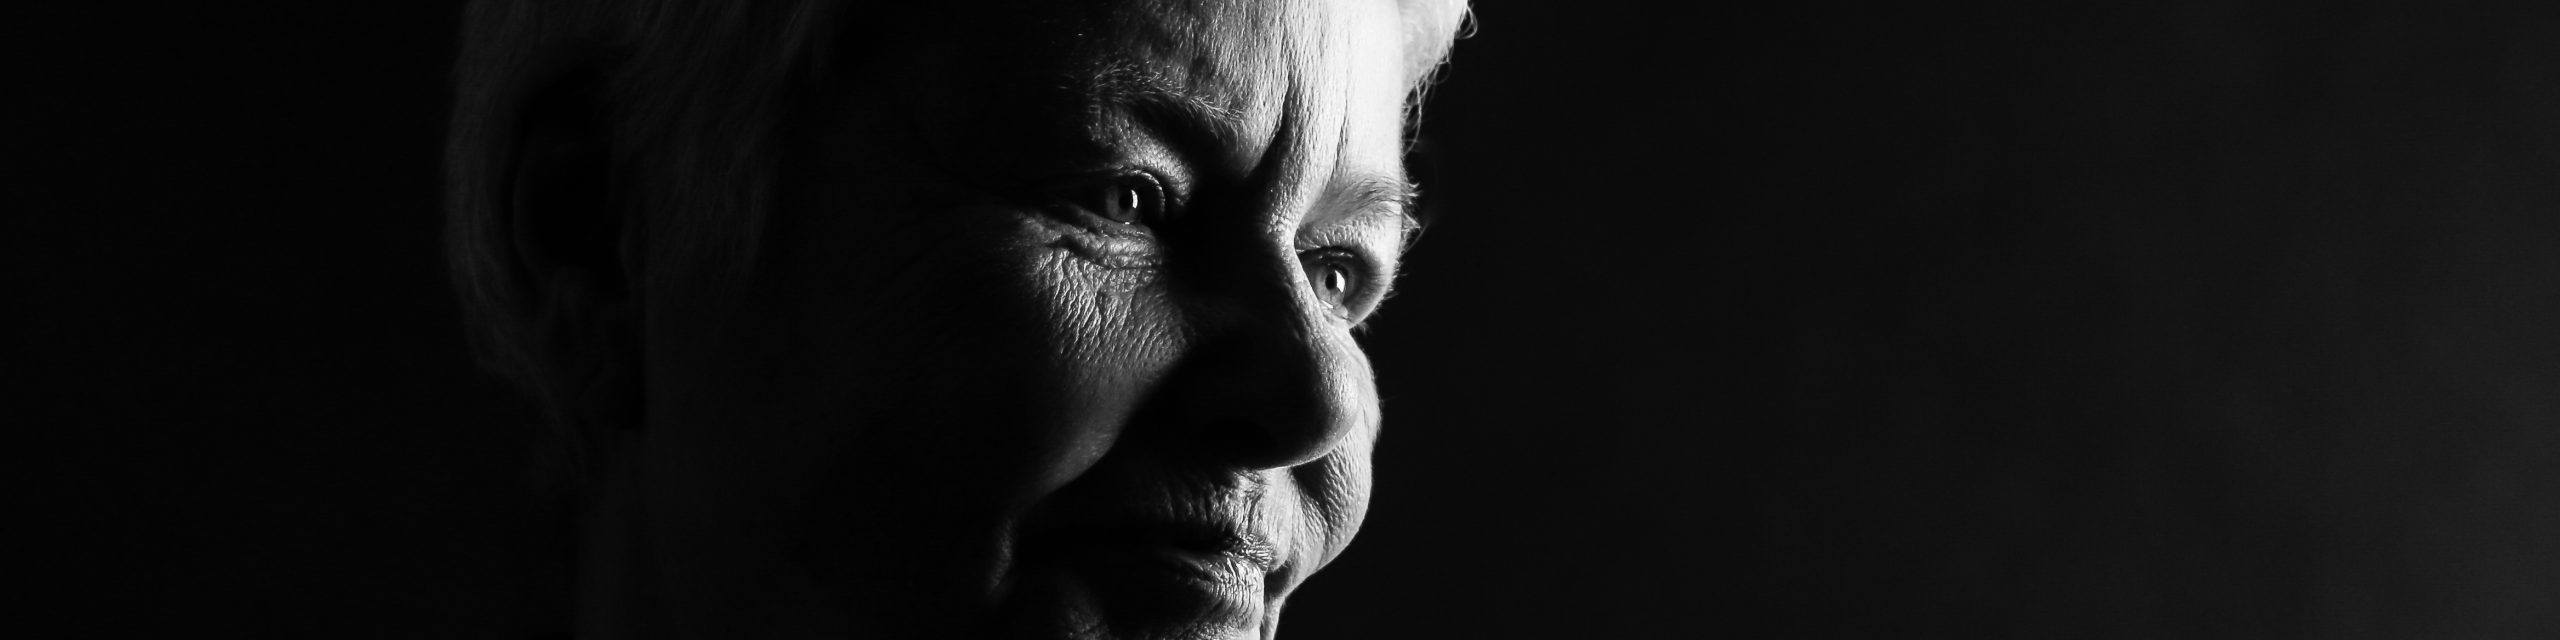 zwart wit portret Ilja Verstraten, herinneringsfotografie